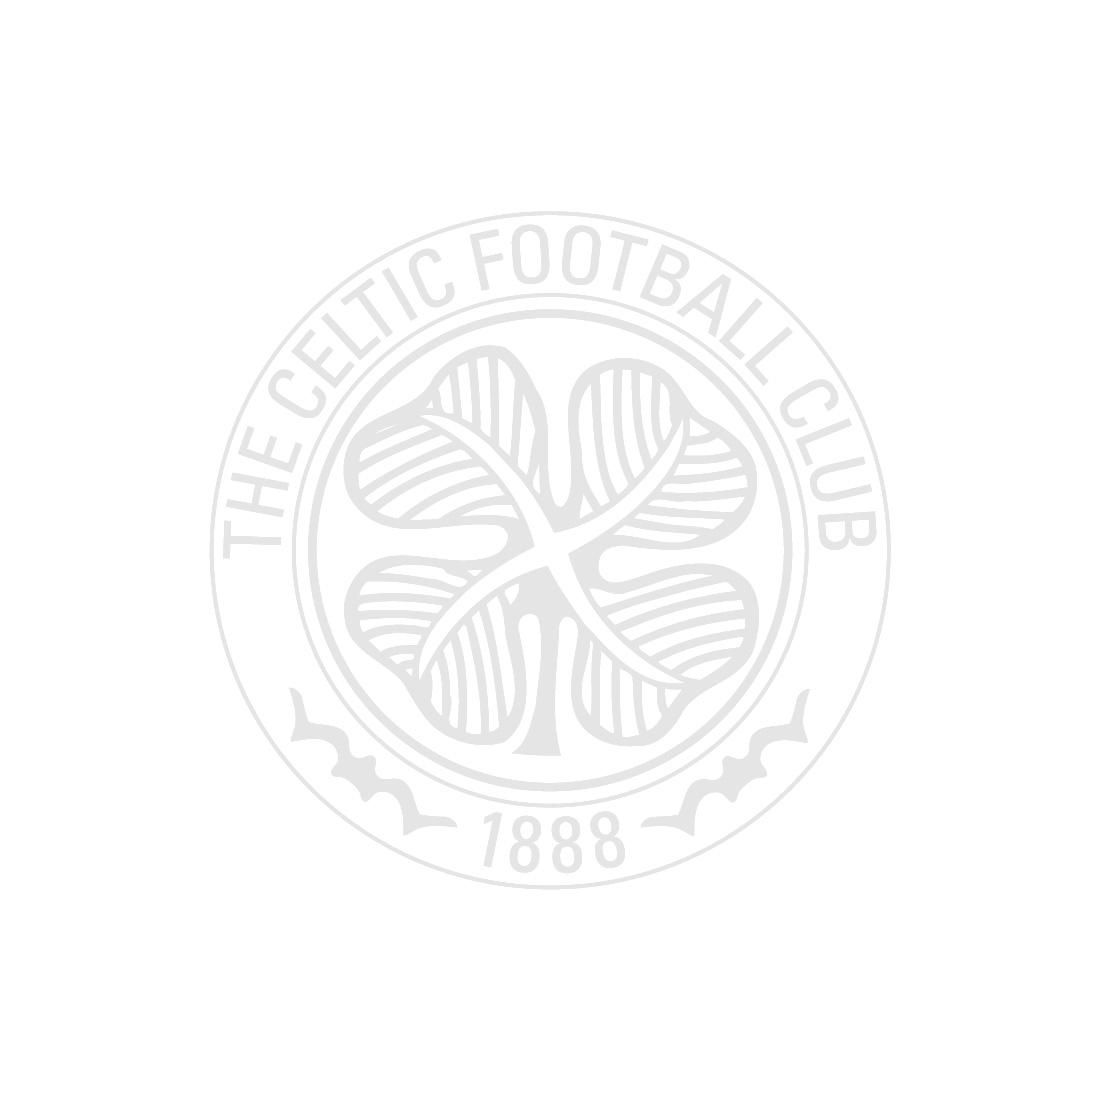 Celtic Inner Contrast Crest Matte Mug